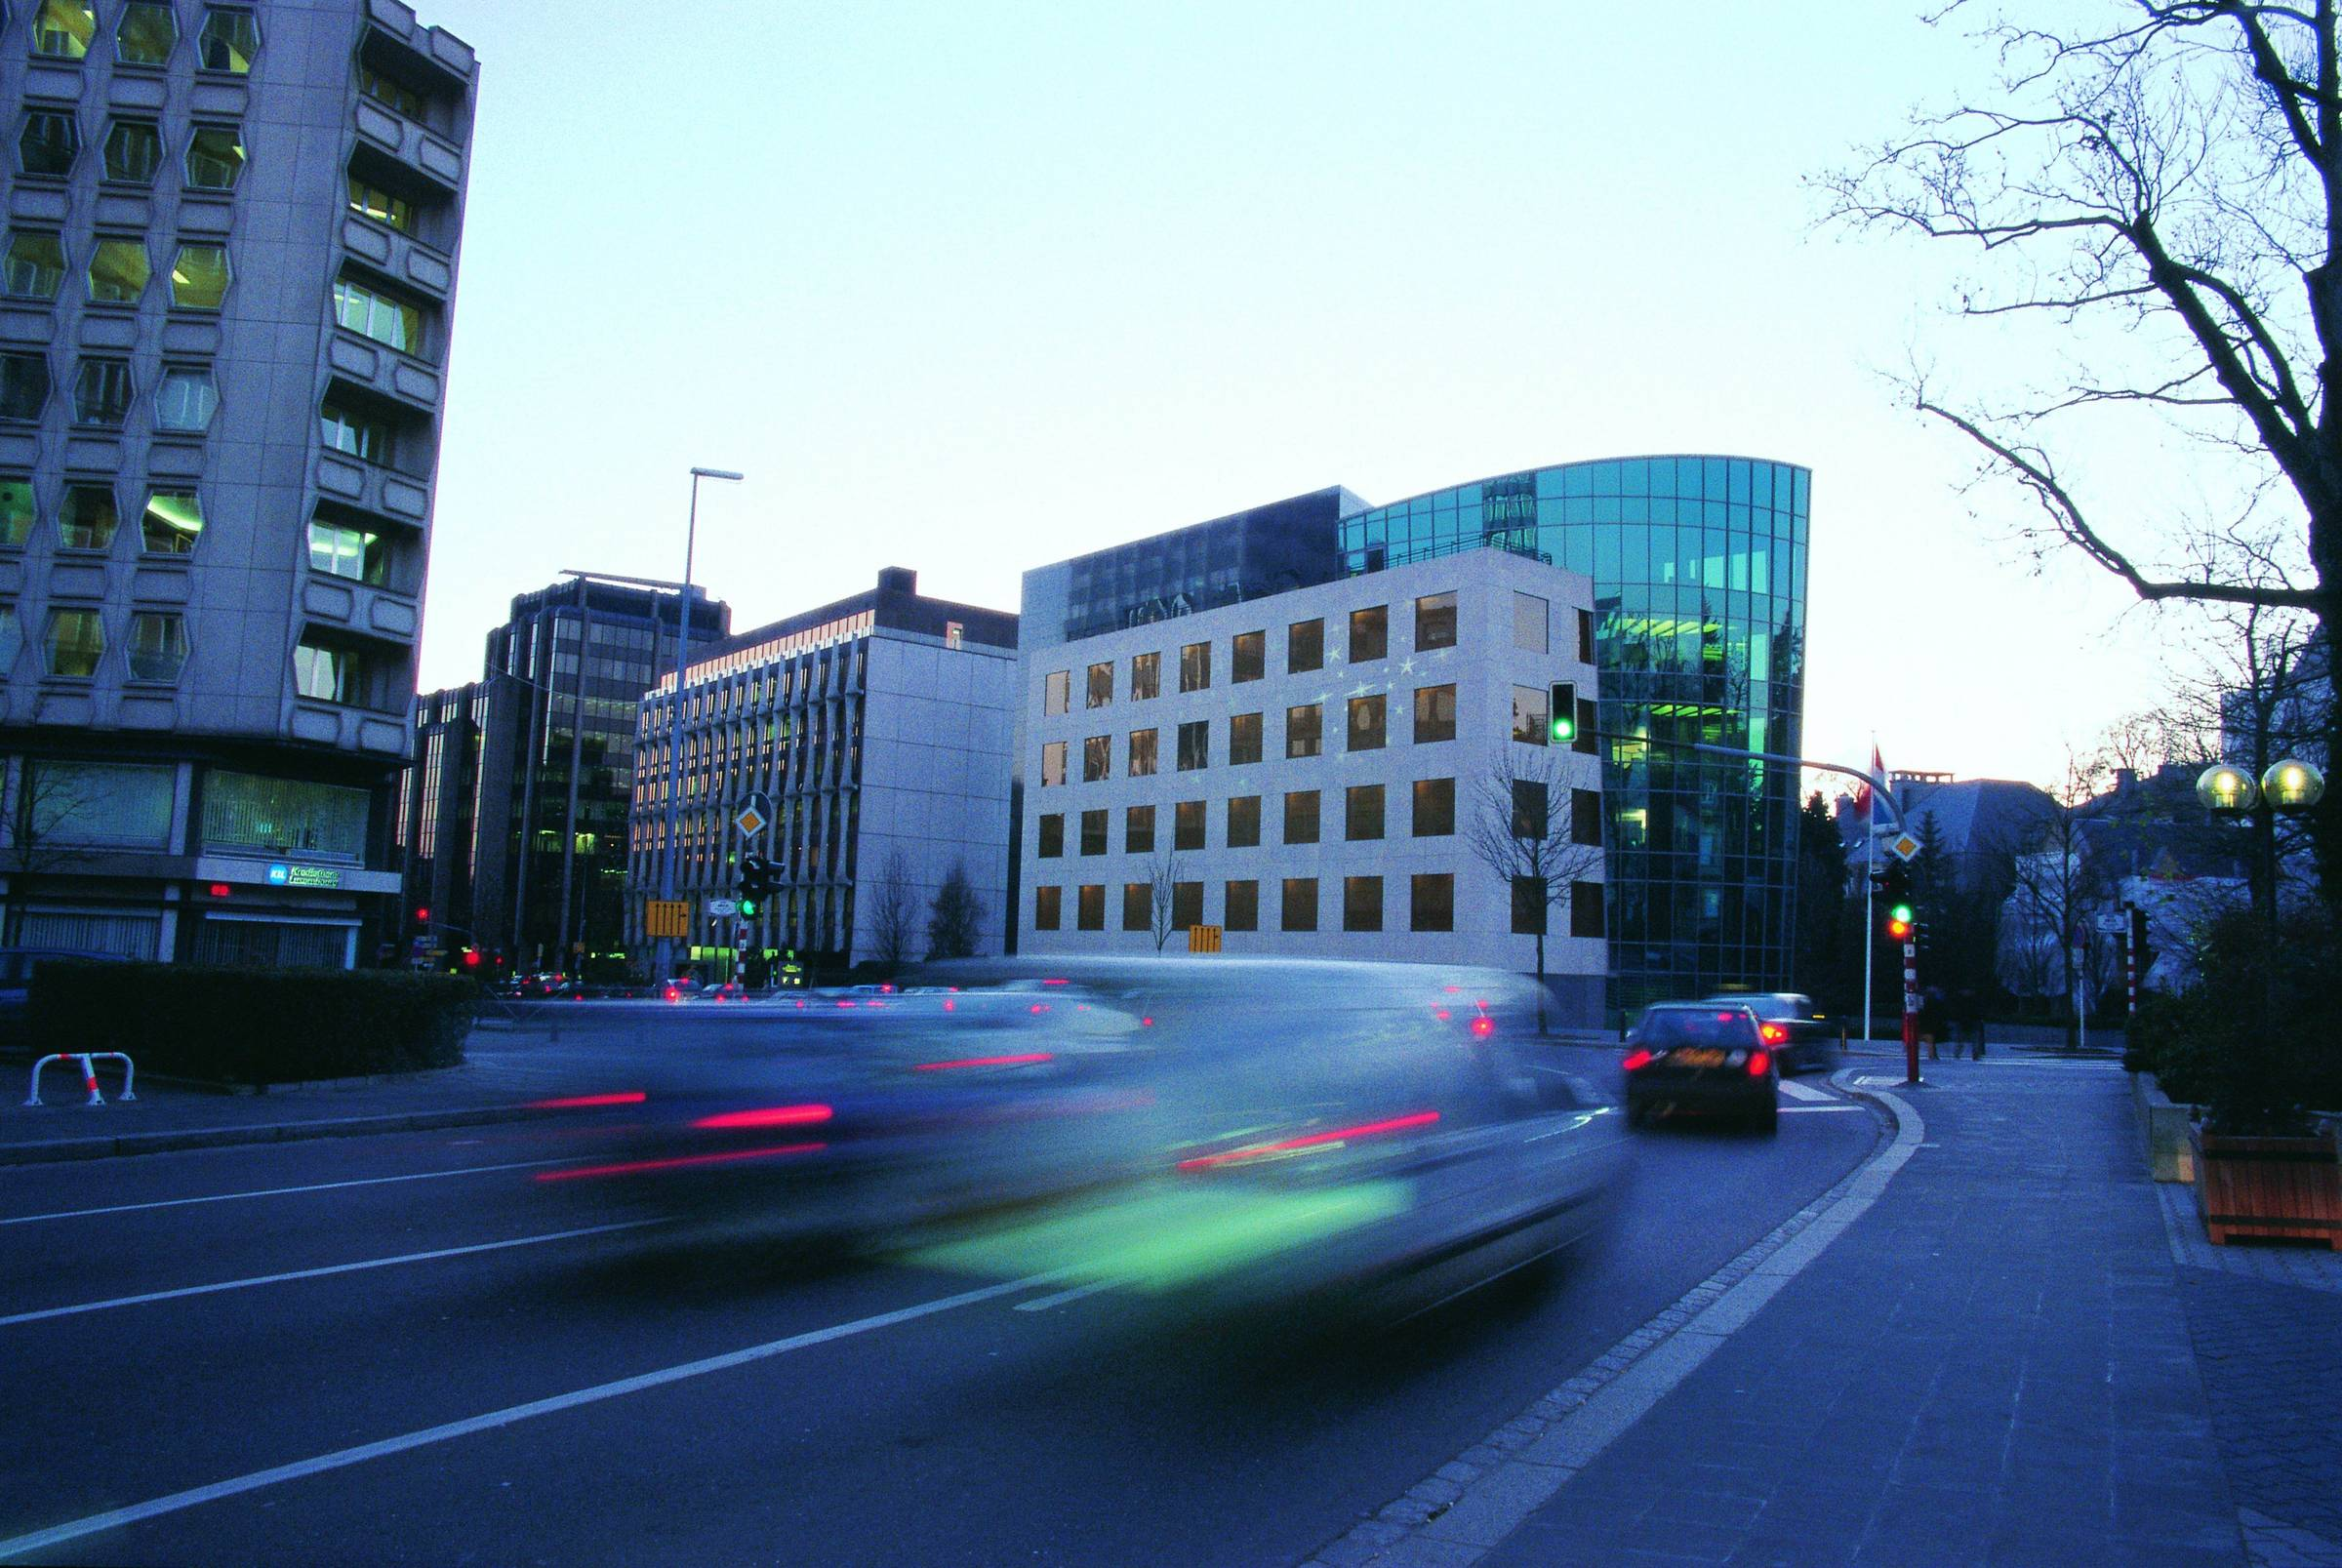 Bancos de Luxemburgo